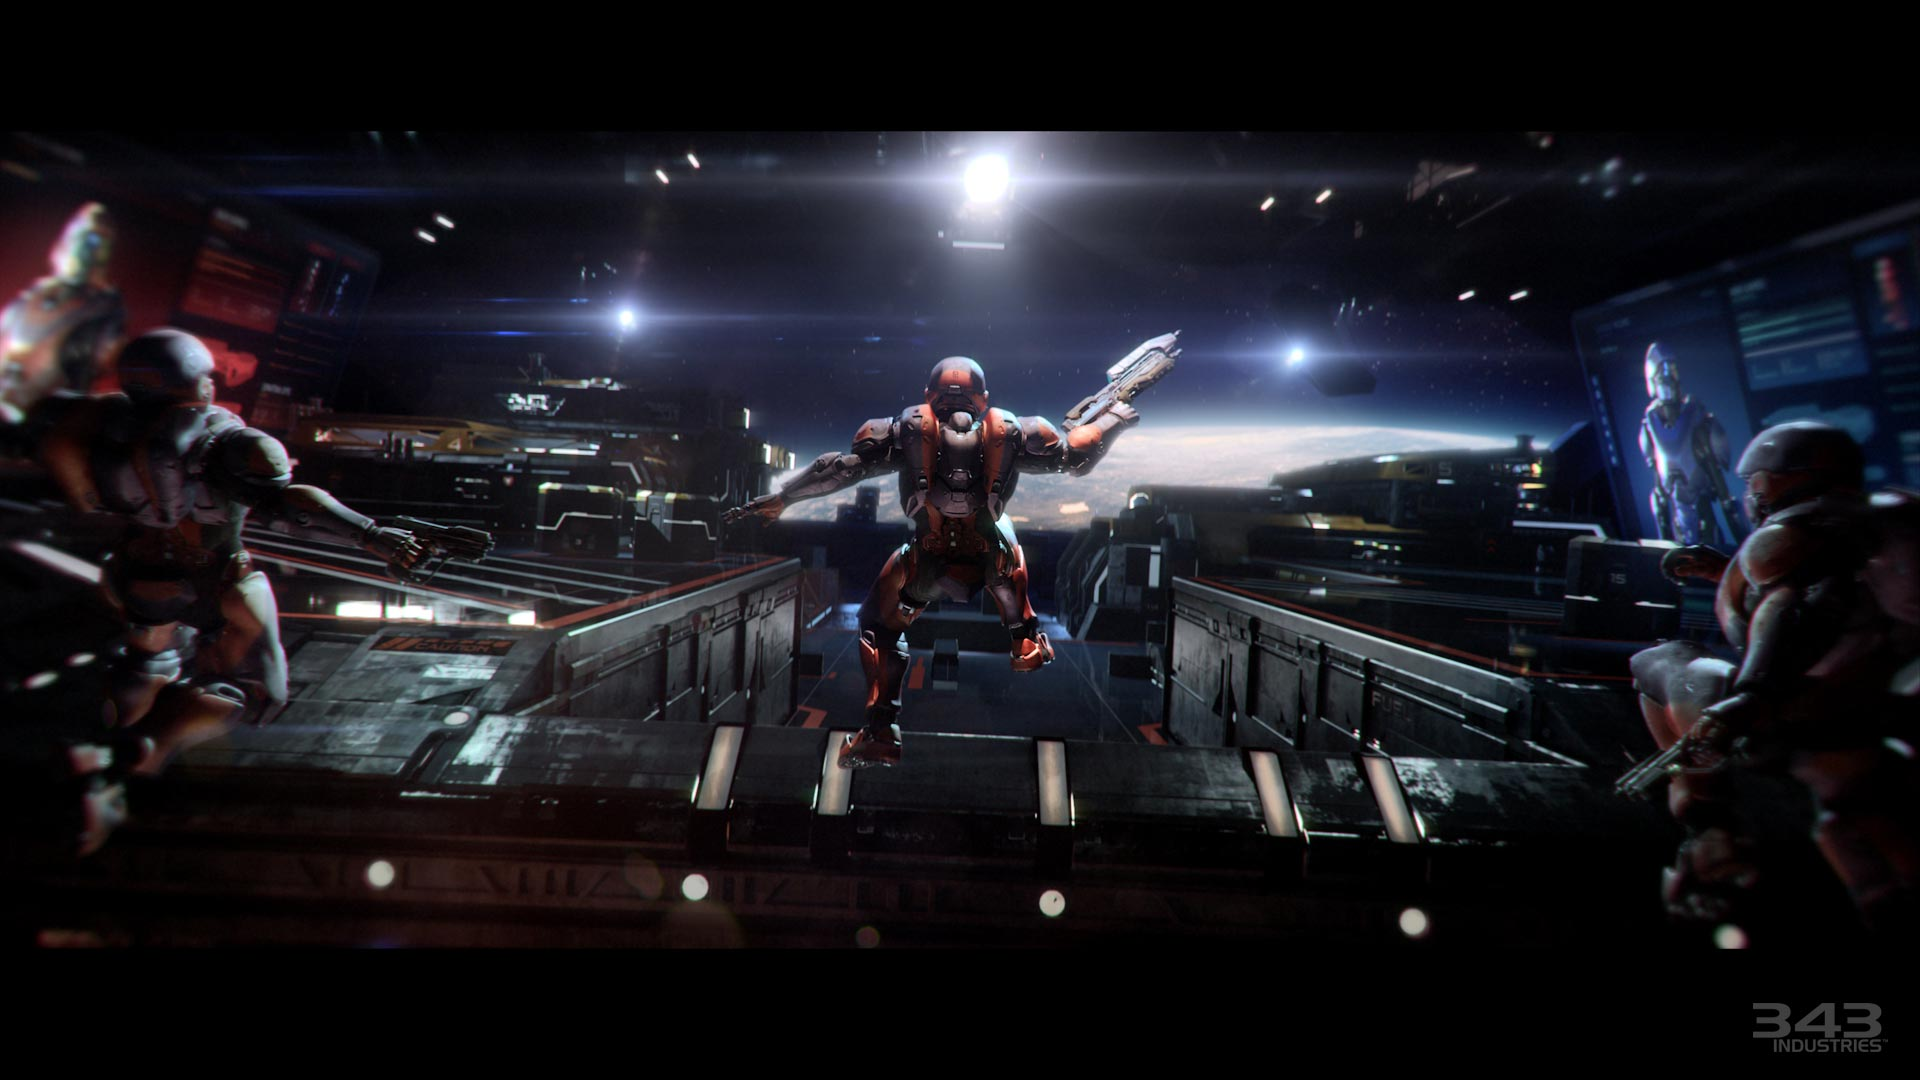 Watching Halo Nightfall Series Unlocks Meaningful Halo 5 Beta Content